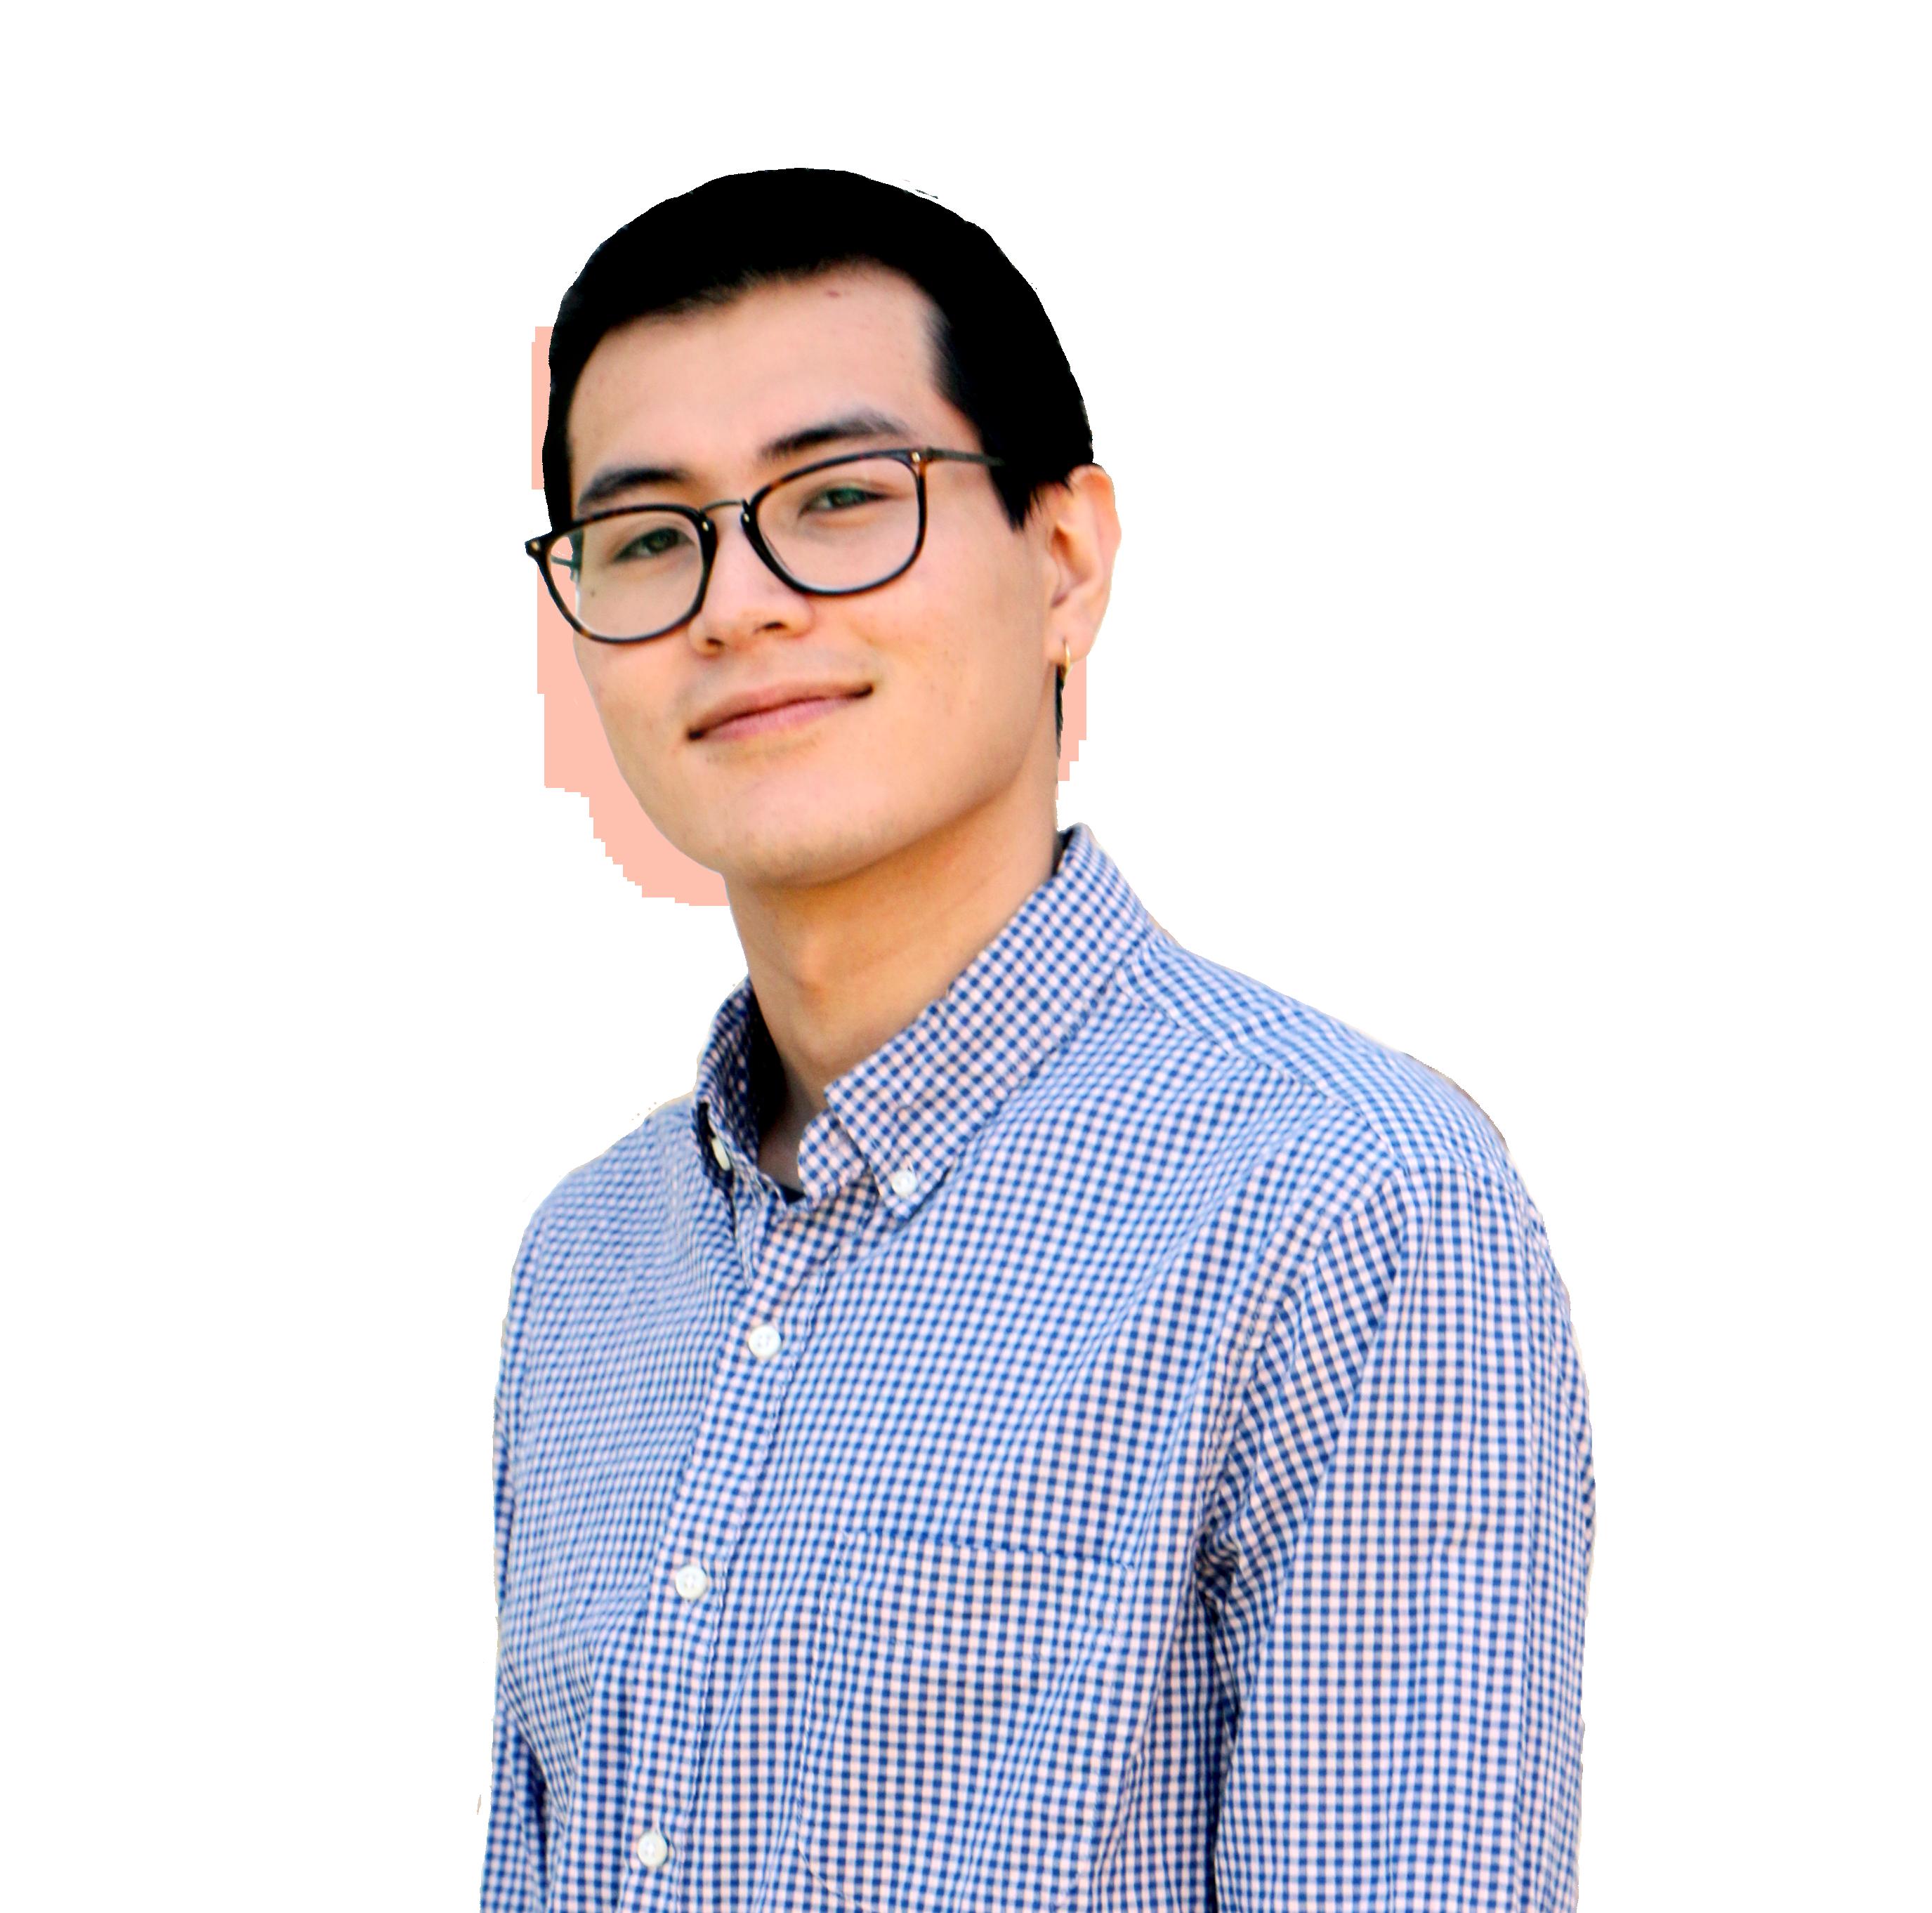 Zamir Almazbek, Saulsbury Hill Financial Sales & Marketing Team, professional headshot.